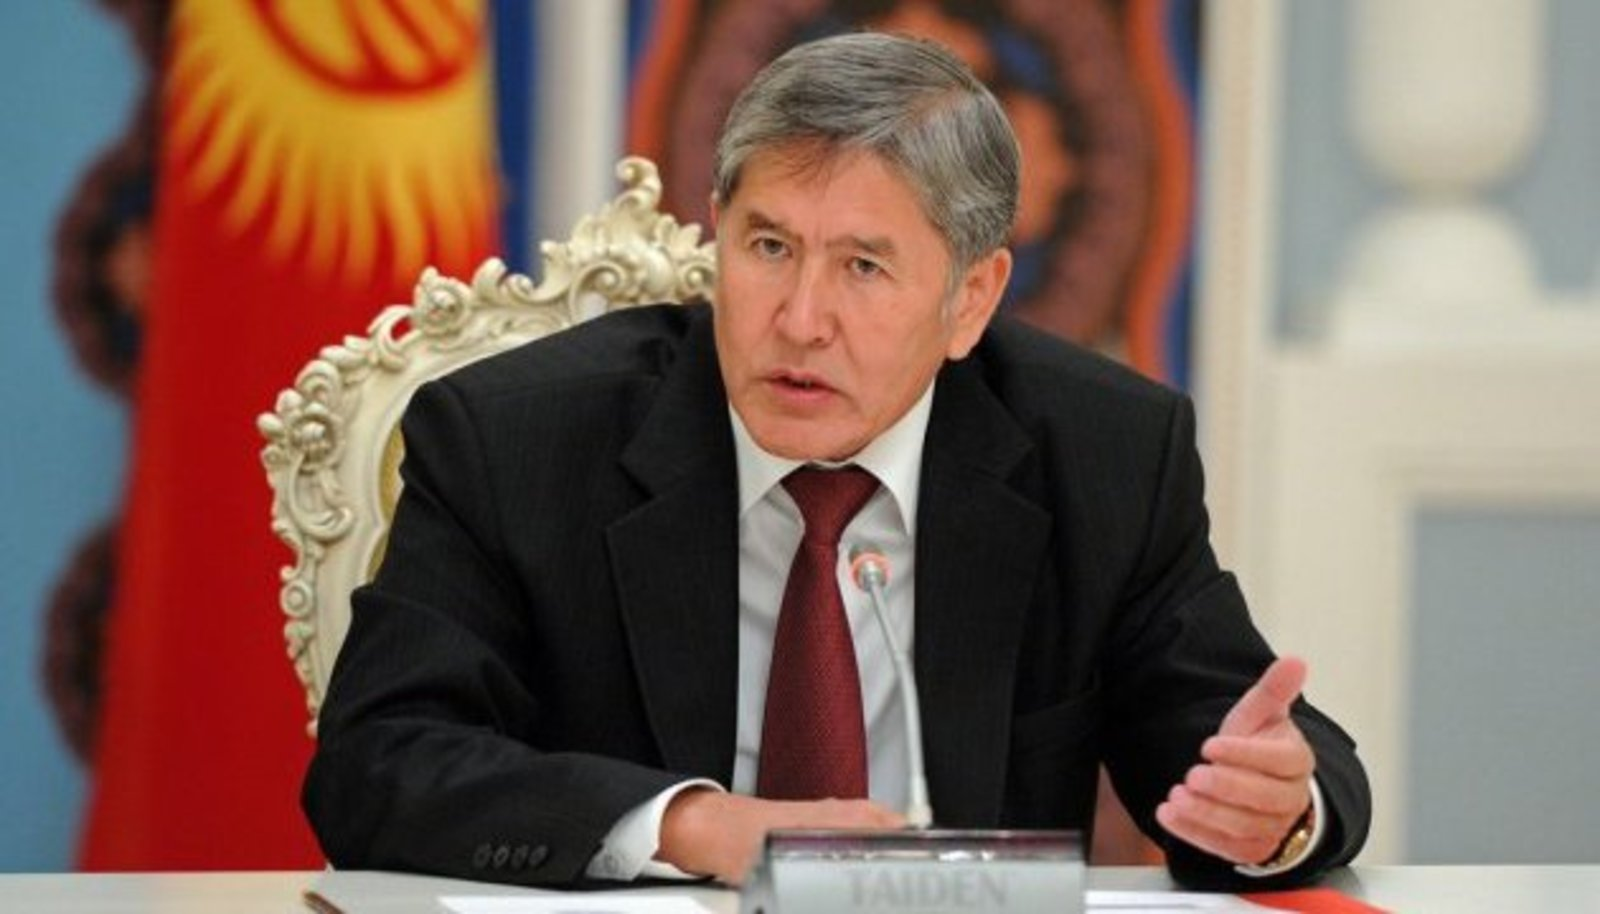 Екс-президента Киргизстану позбавили недоторканності